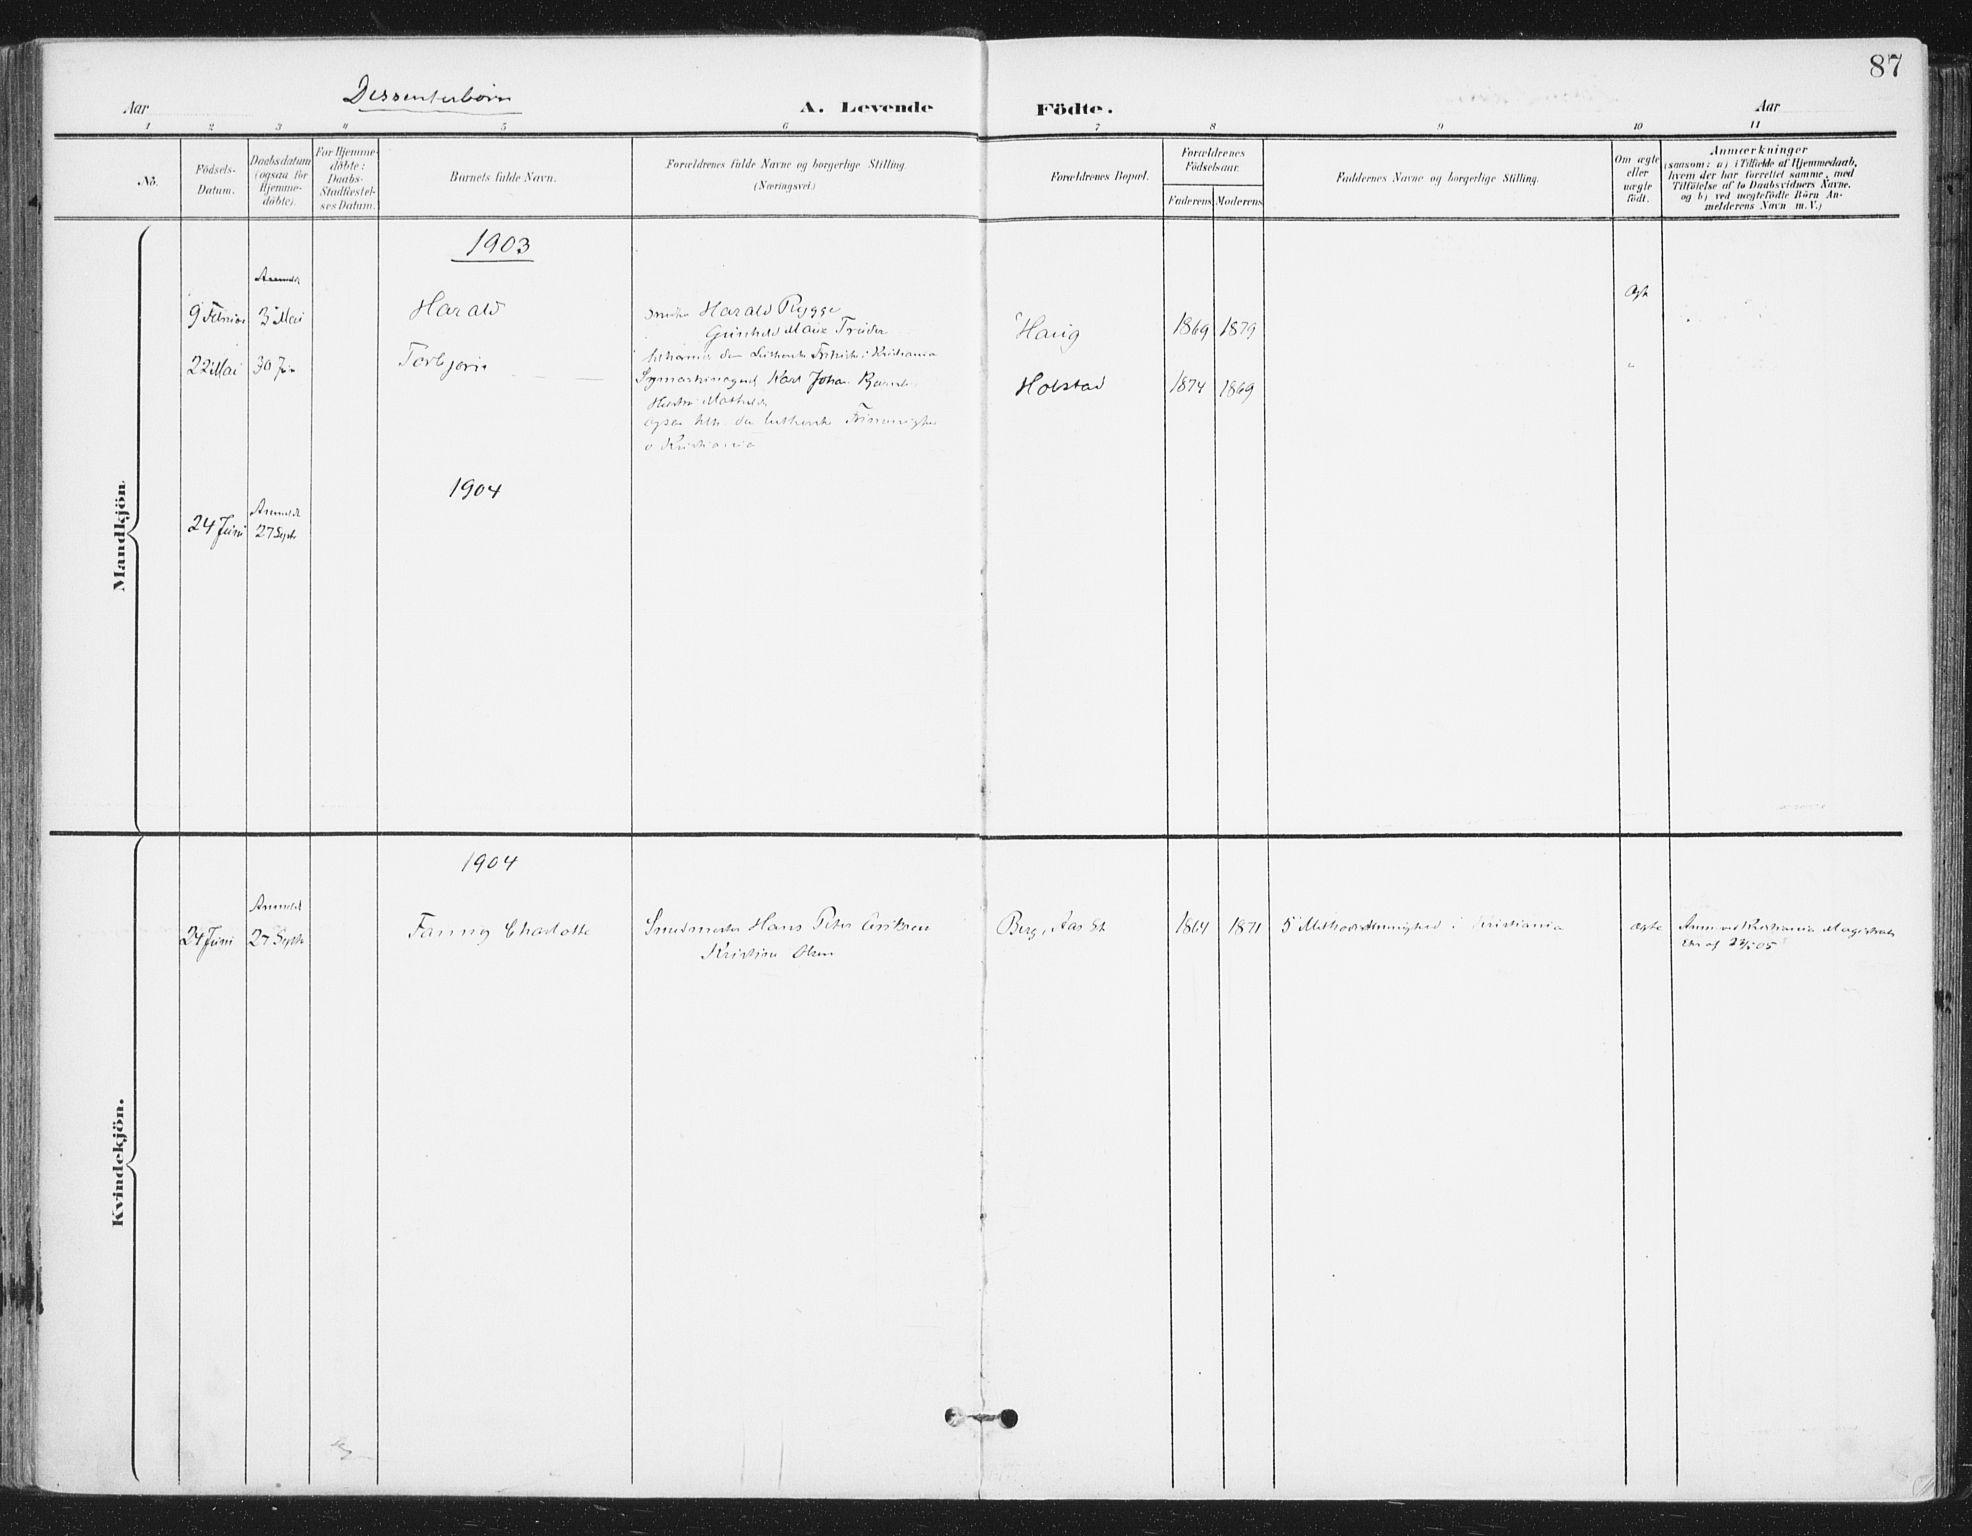 SAO, Ås prestekontor Kirkebøker, F/Fa/L0010: Ministerialbok nr. I 10, 1900-1918, s. 87